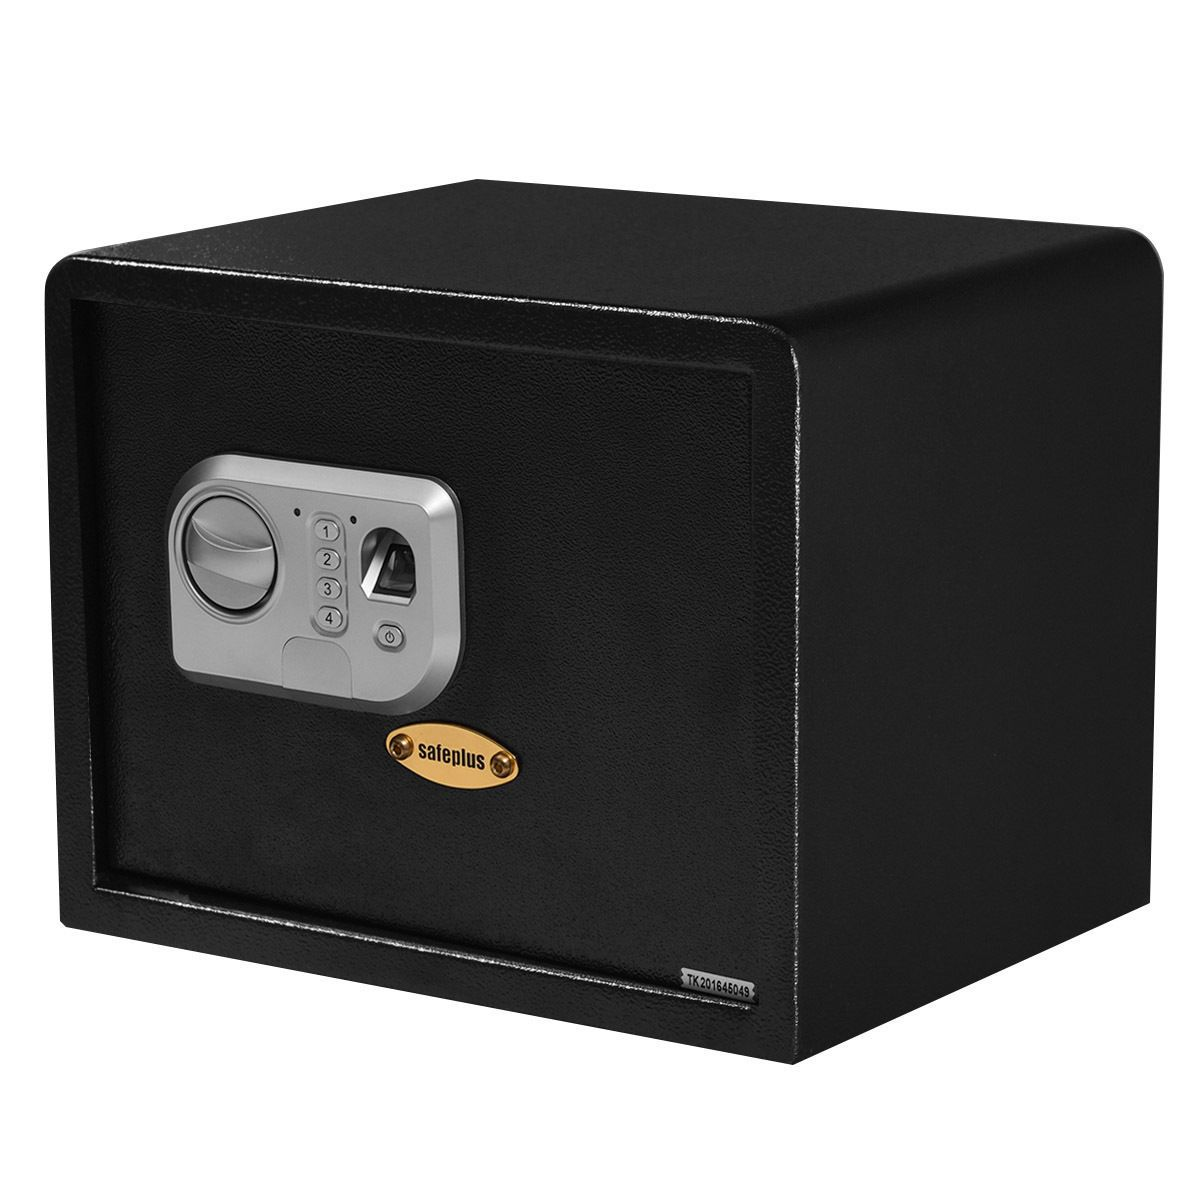 15 biometric fingerprint electronic digital wall safe on wall safe id=41519